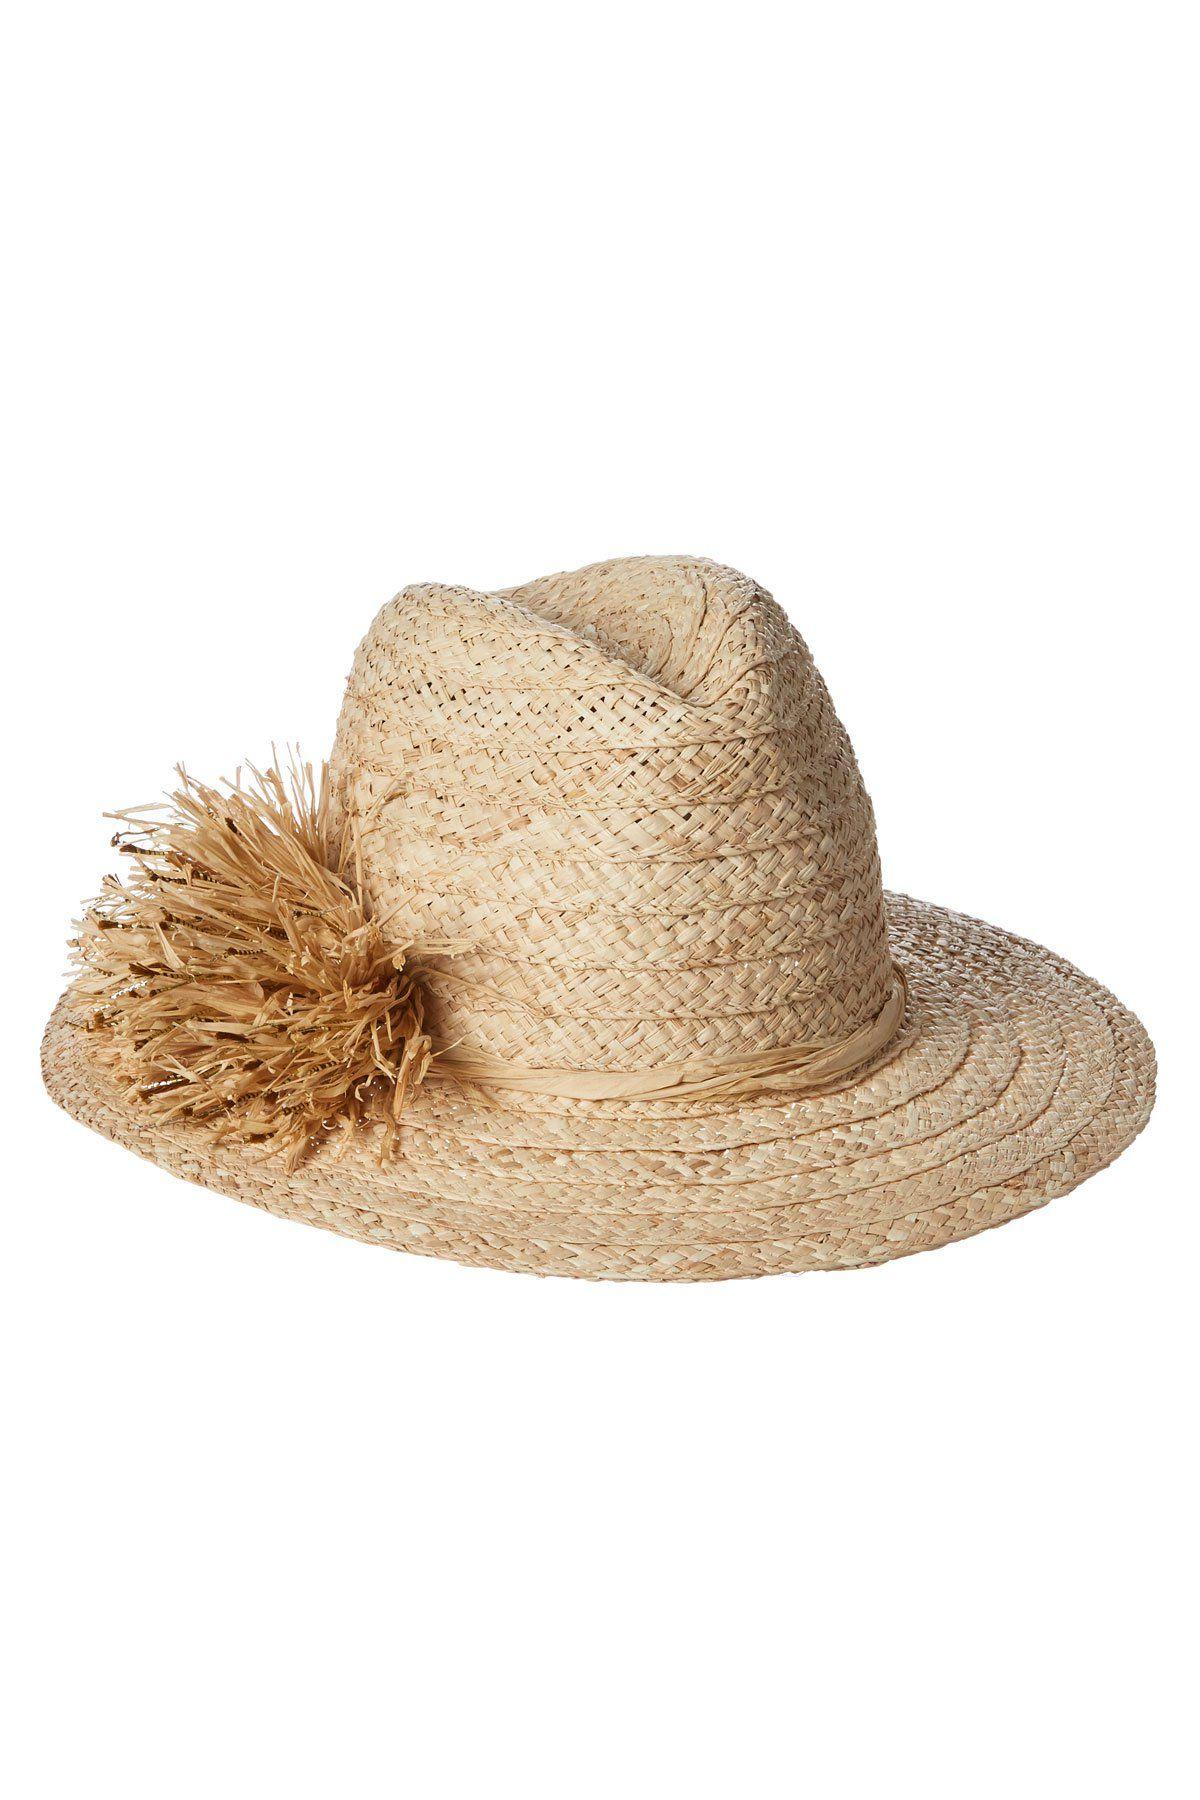 Hat Attack S Sun Hats Straw Pom Pom Rancher Hat Hats Womens Fedora Sun Hats